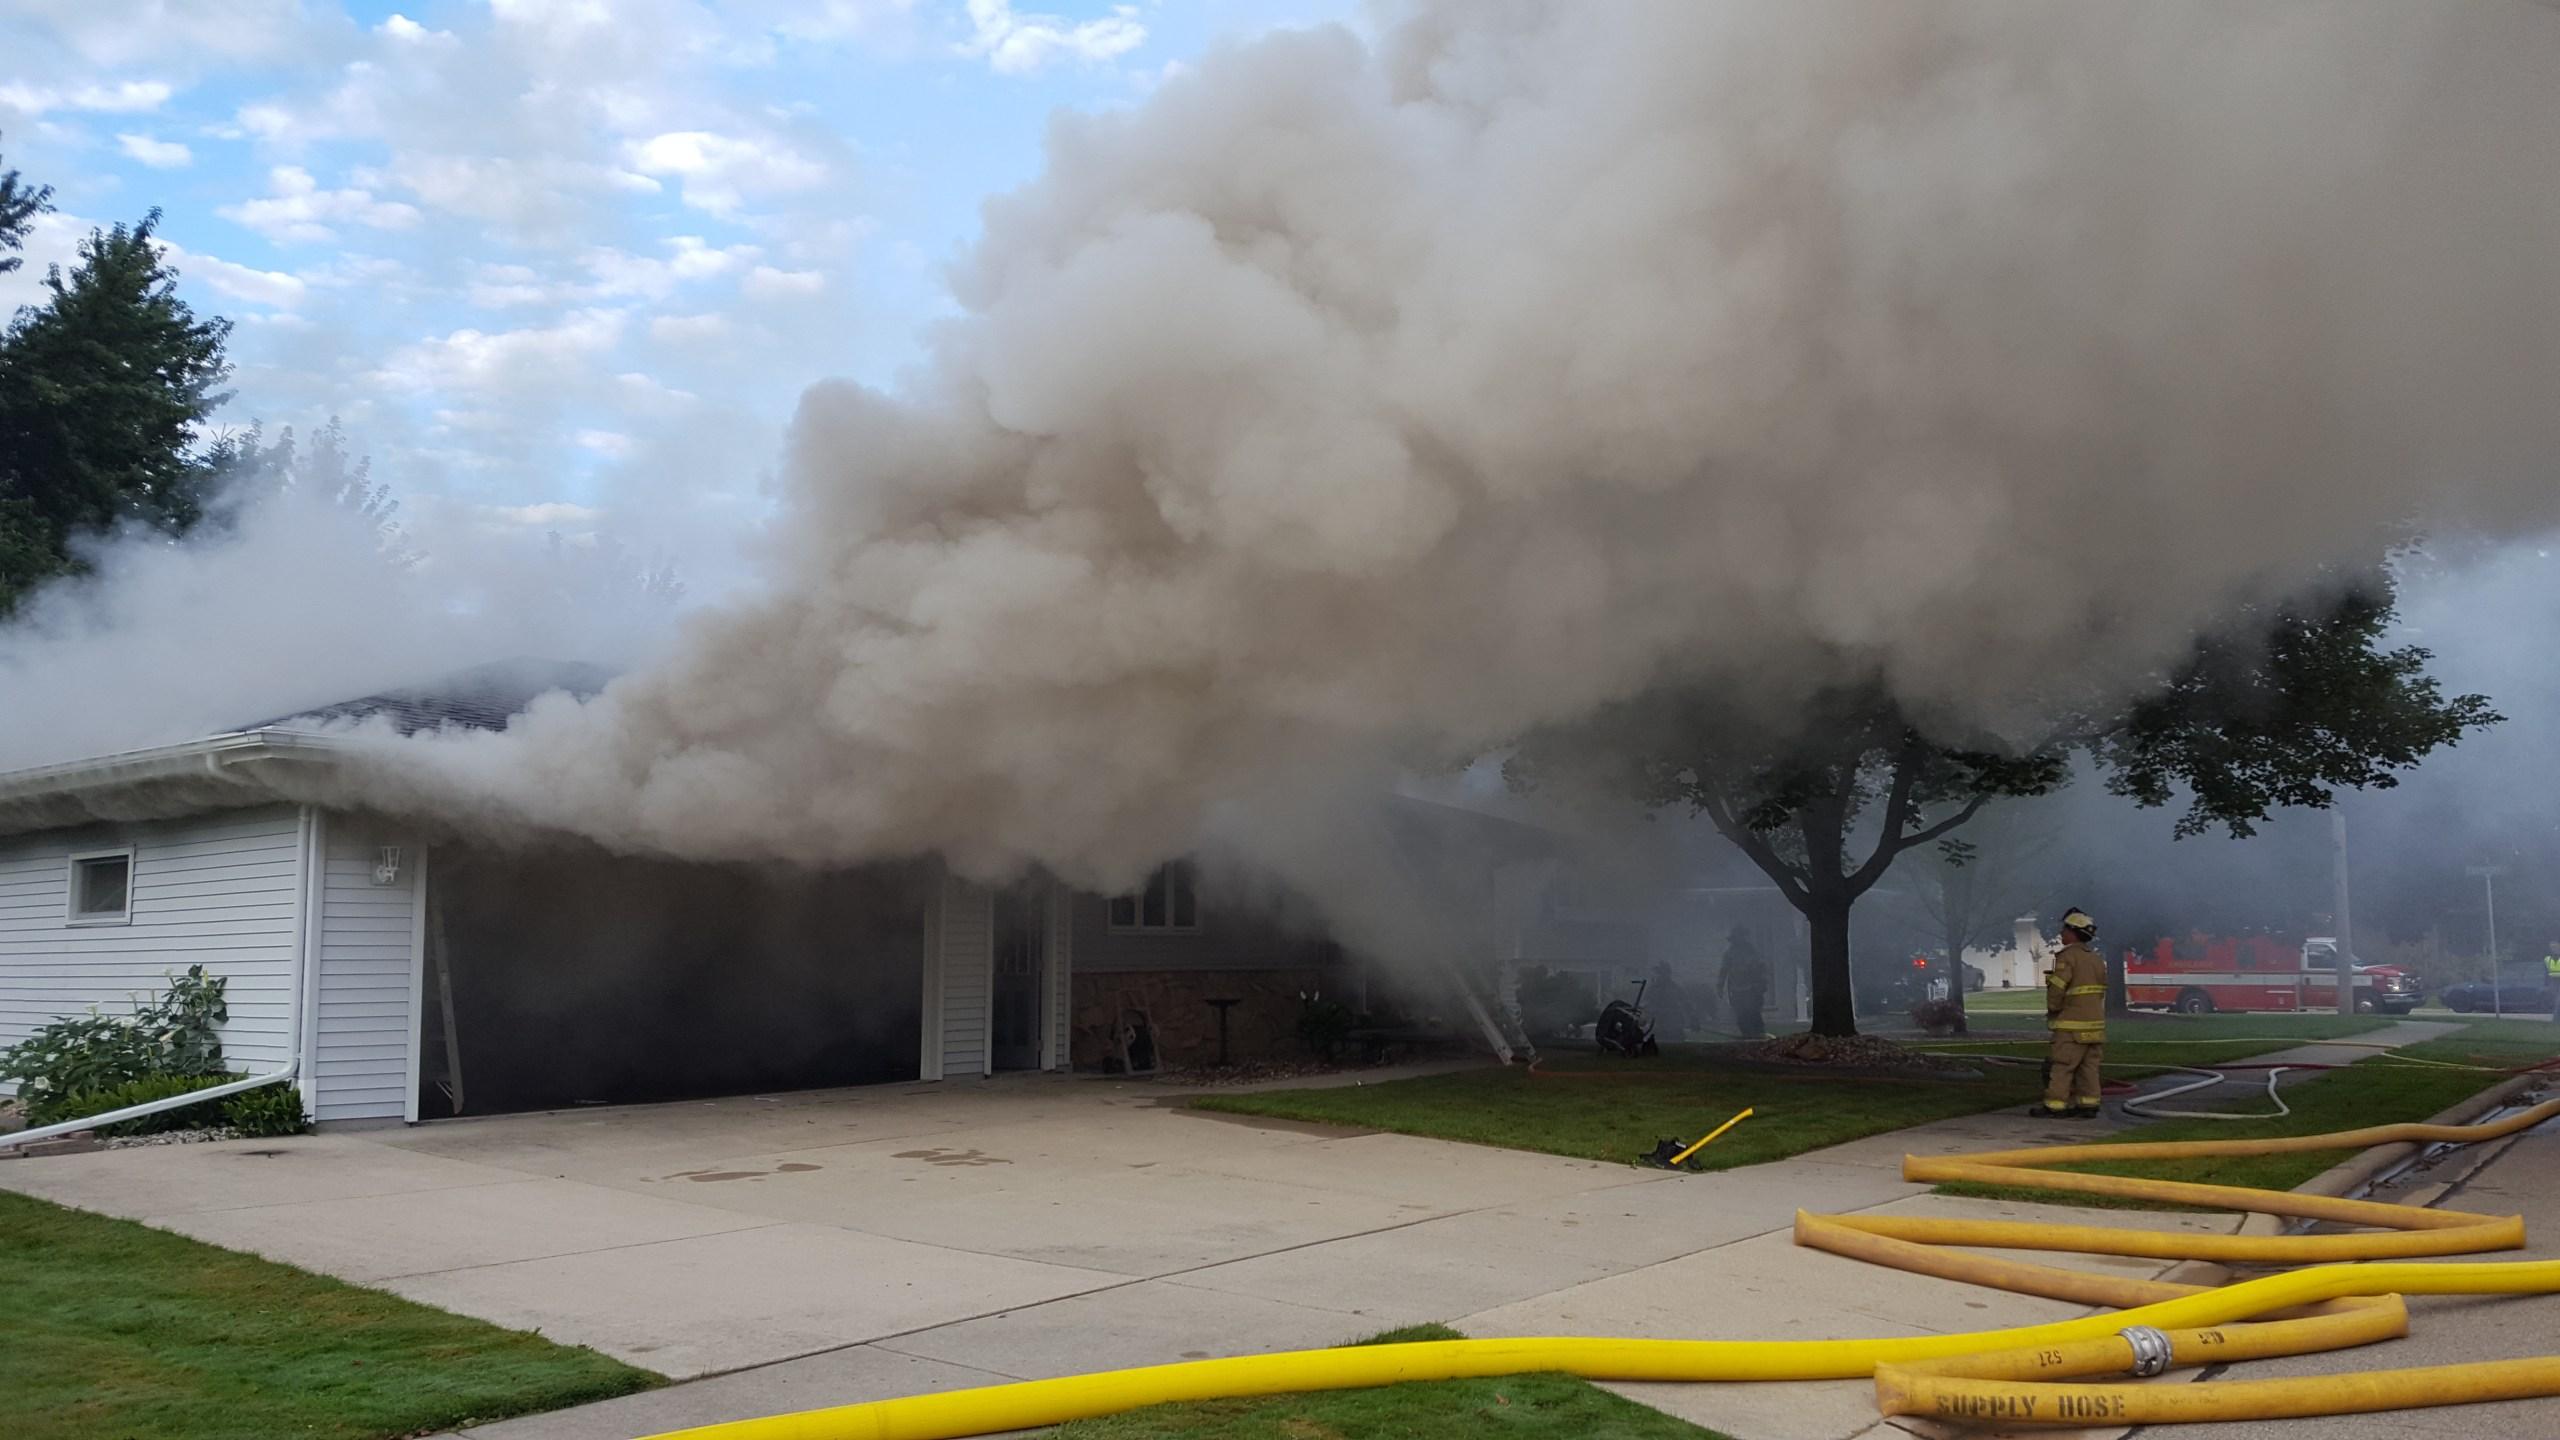 557 Willow Drive fire_1504377500420.jpg